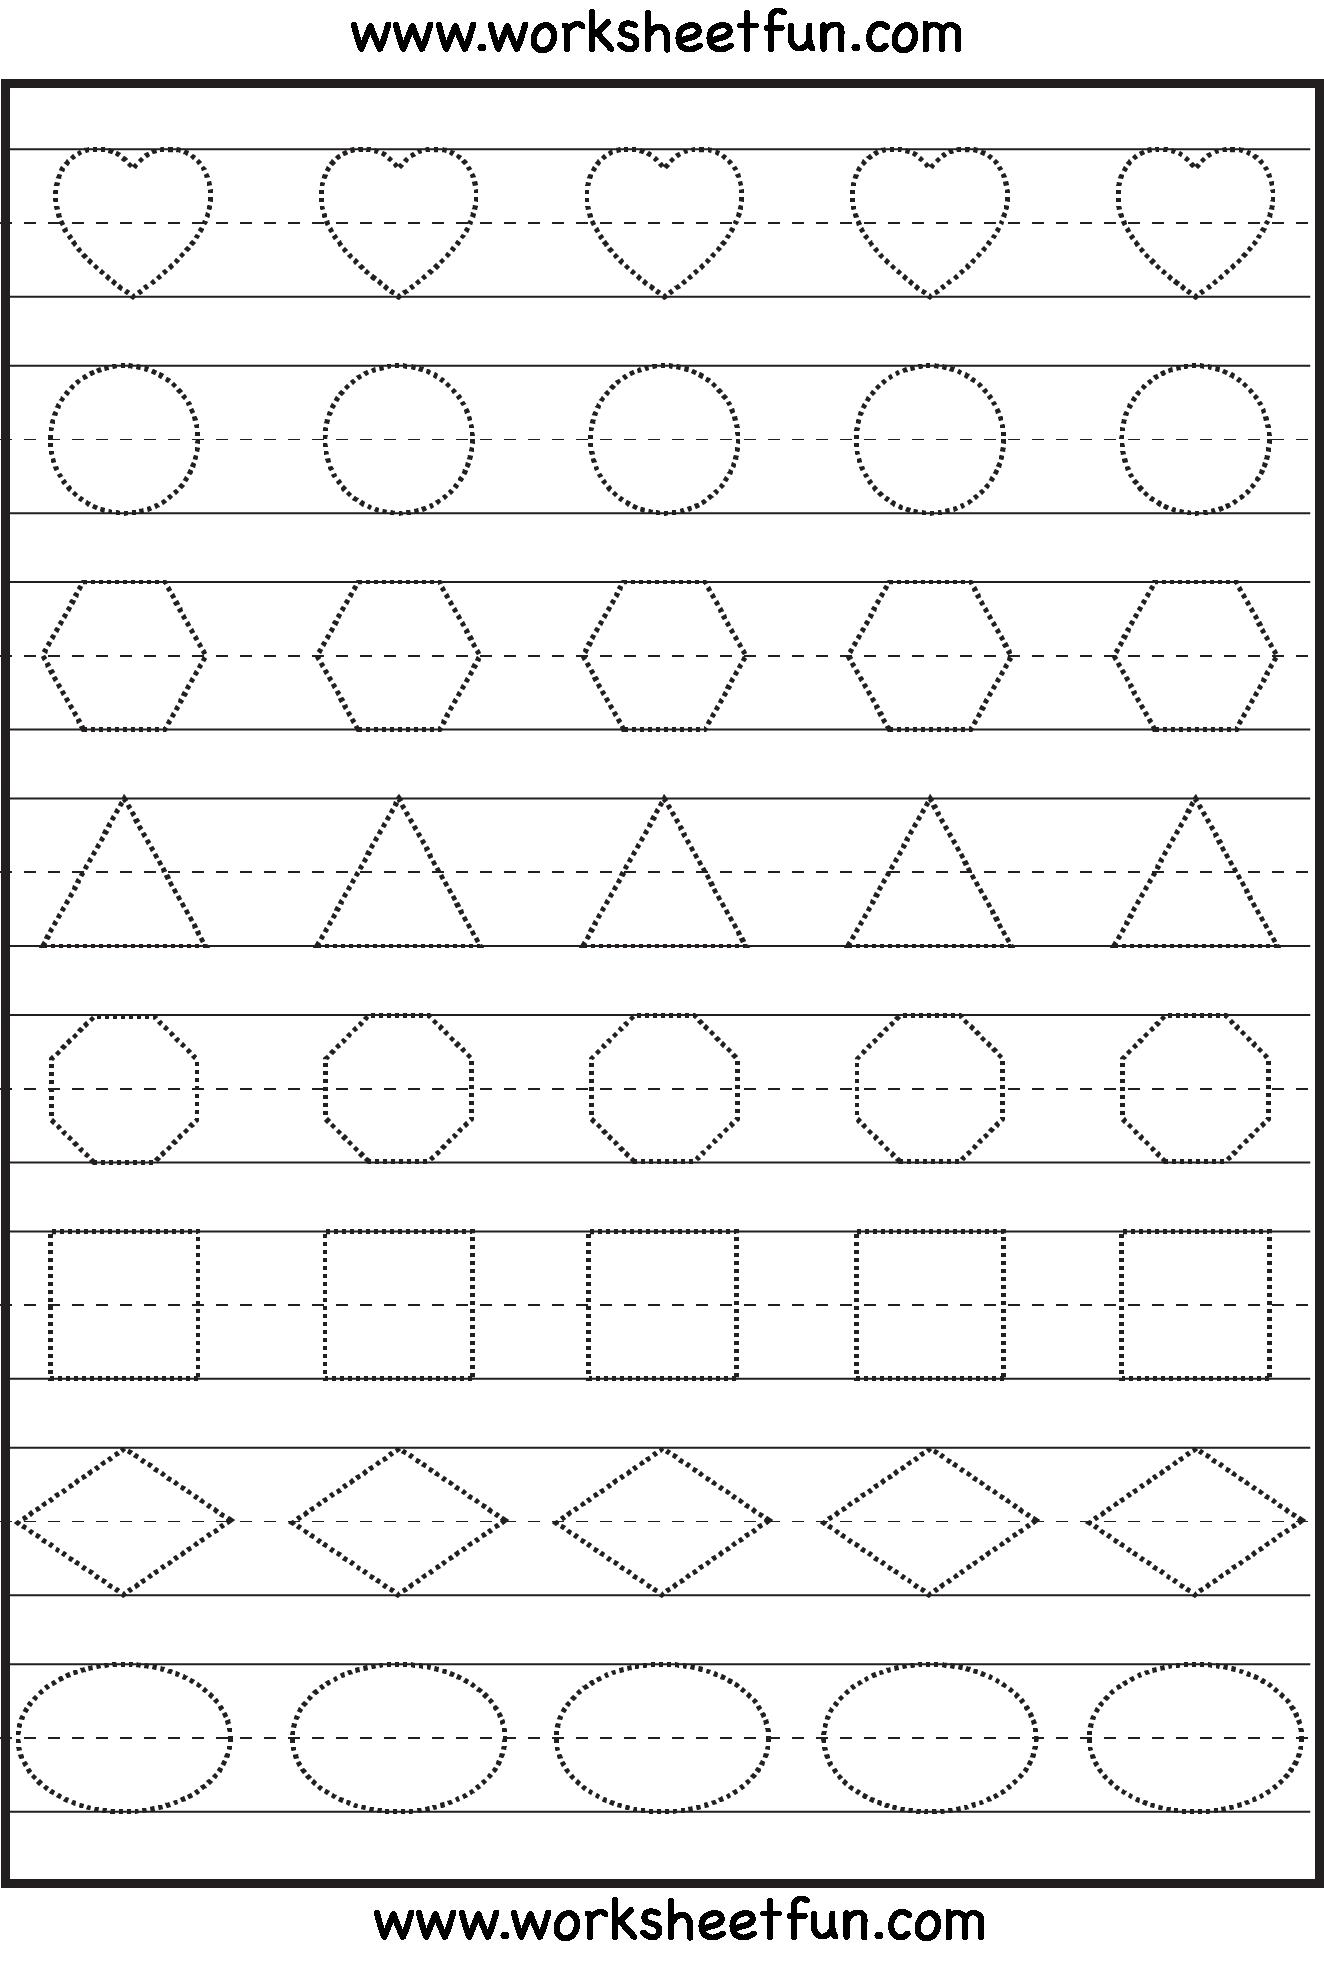 7 Images of Printable Worksheets For Preschool Fun